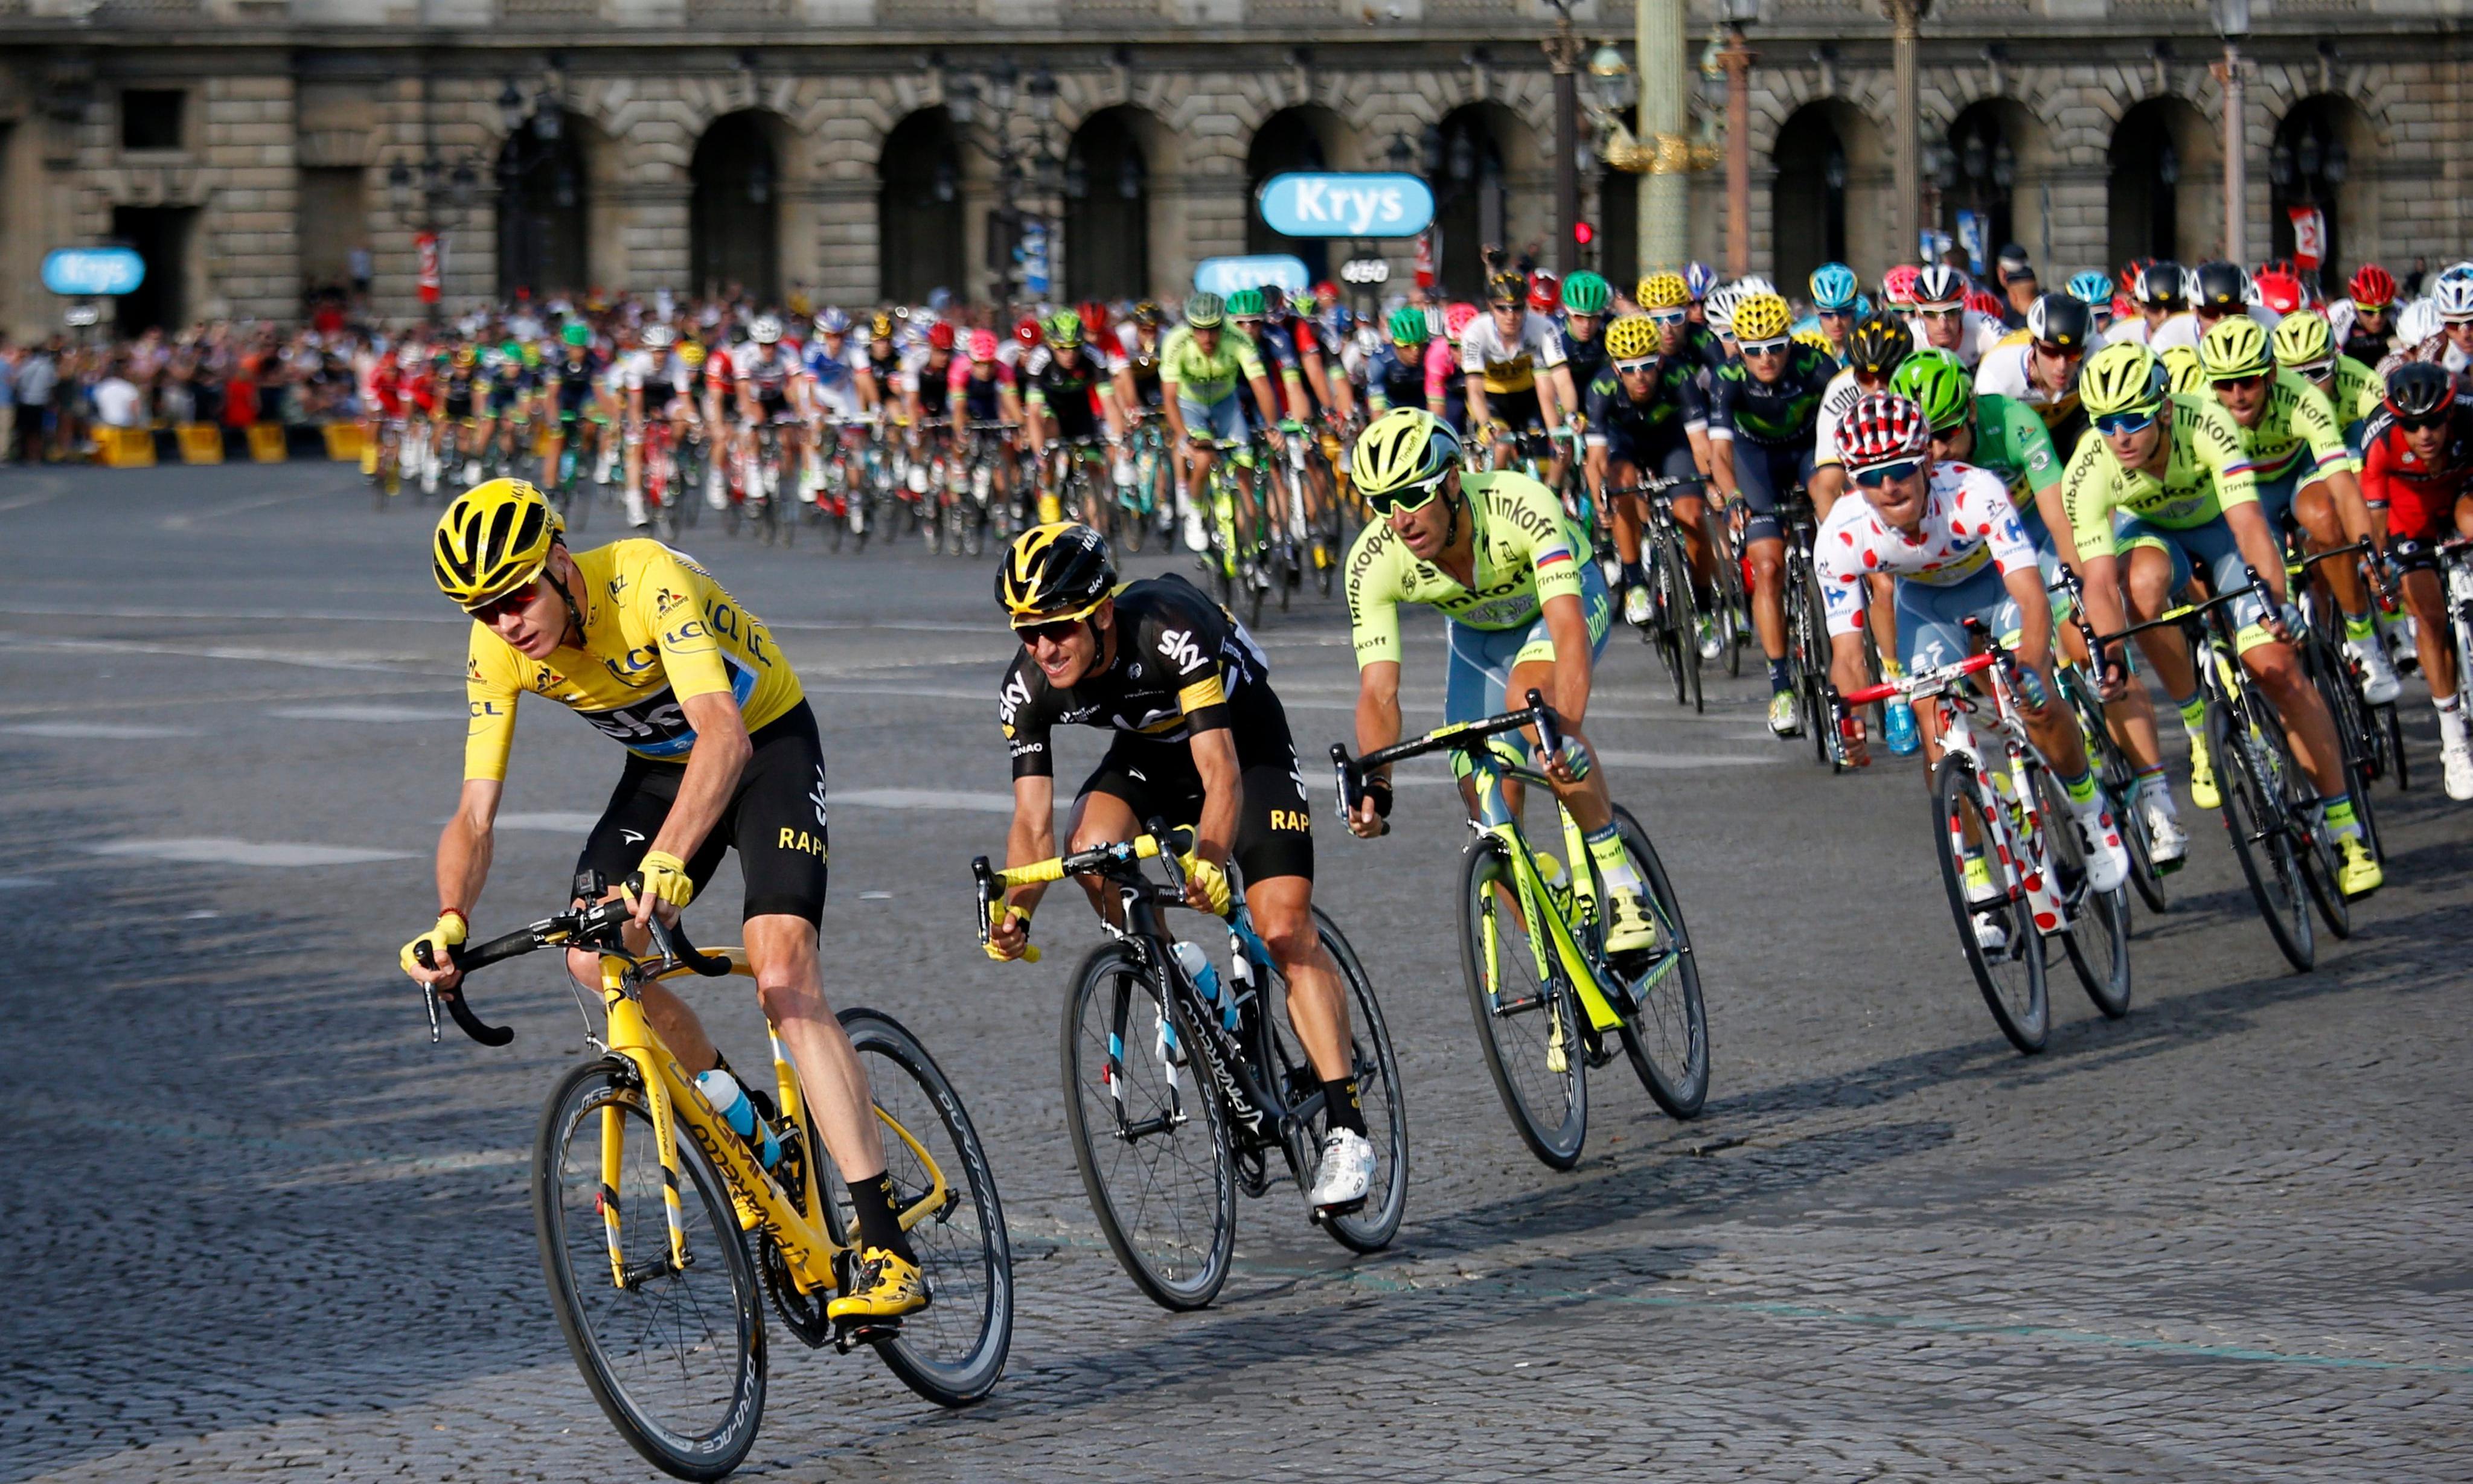 Chris Froome's Tour de France win puts him among greats